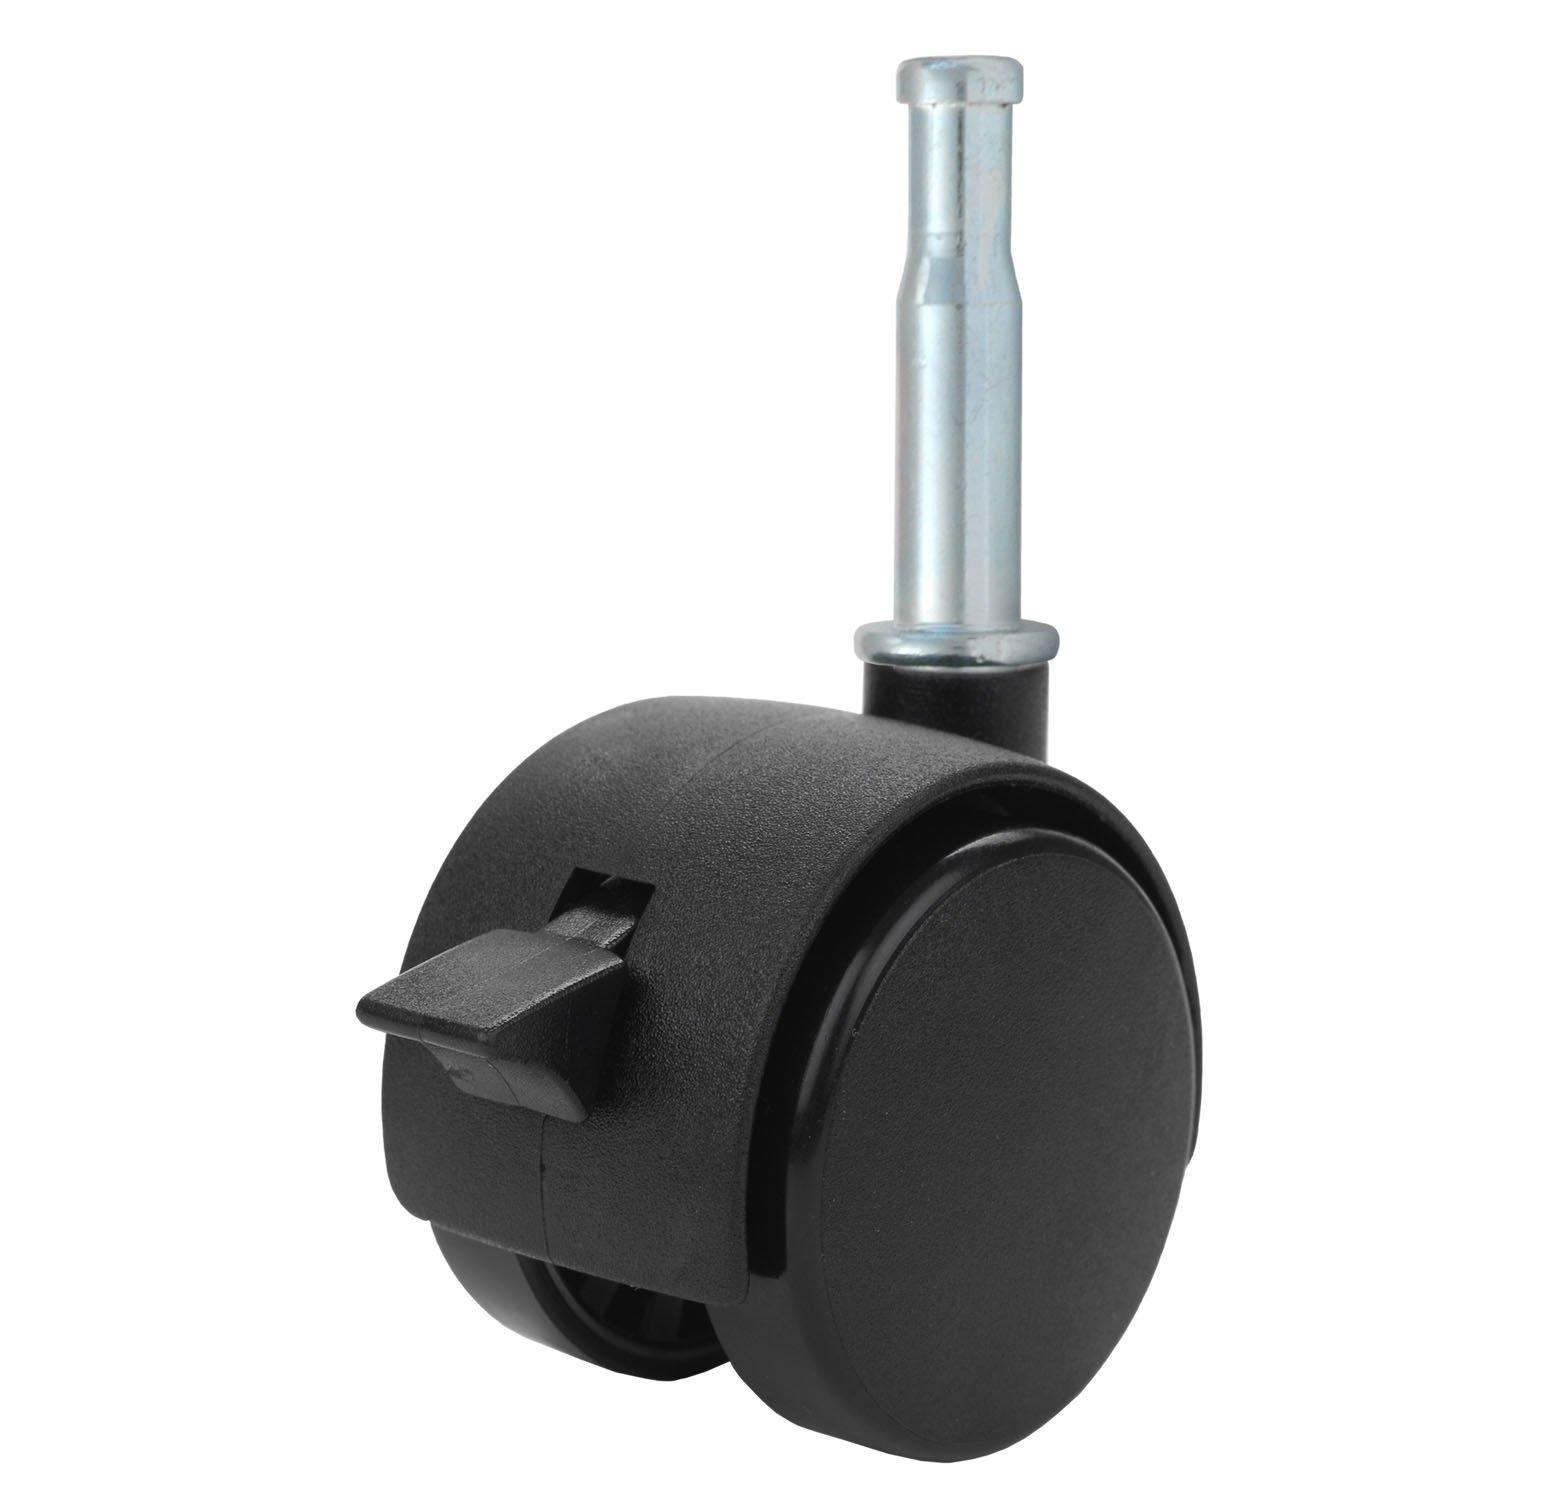 "Twin Wheel Caster Solutions TWHN-40N-G02-BK-B 1.57"" Diameter Nylon Wheel Hooded Brake Caster, 5/16"" Diameter x 1-1/2"" Length Grip Neck Stem, 67 lb Capacity Range"